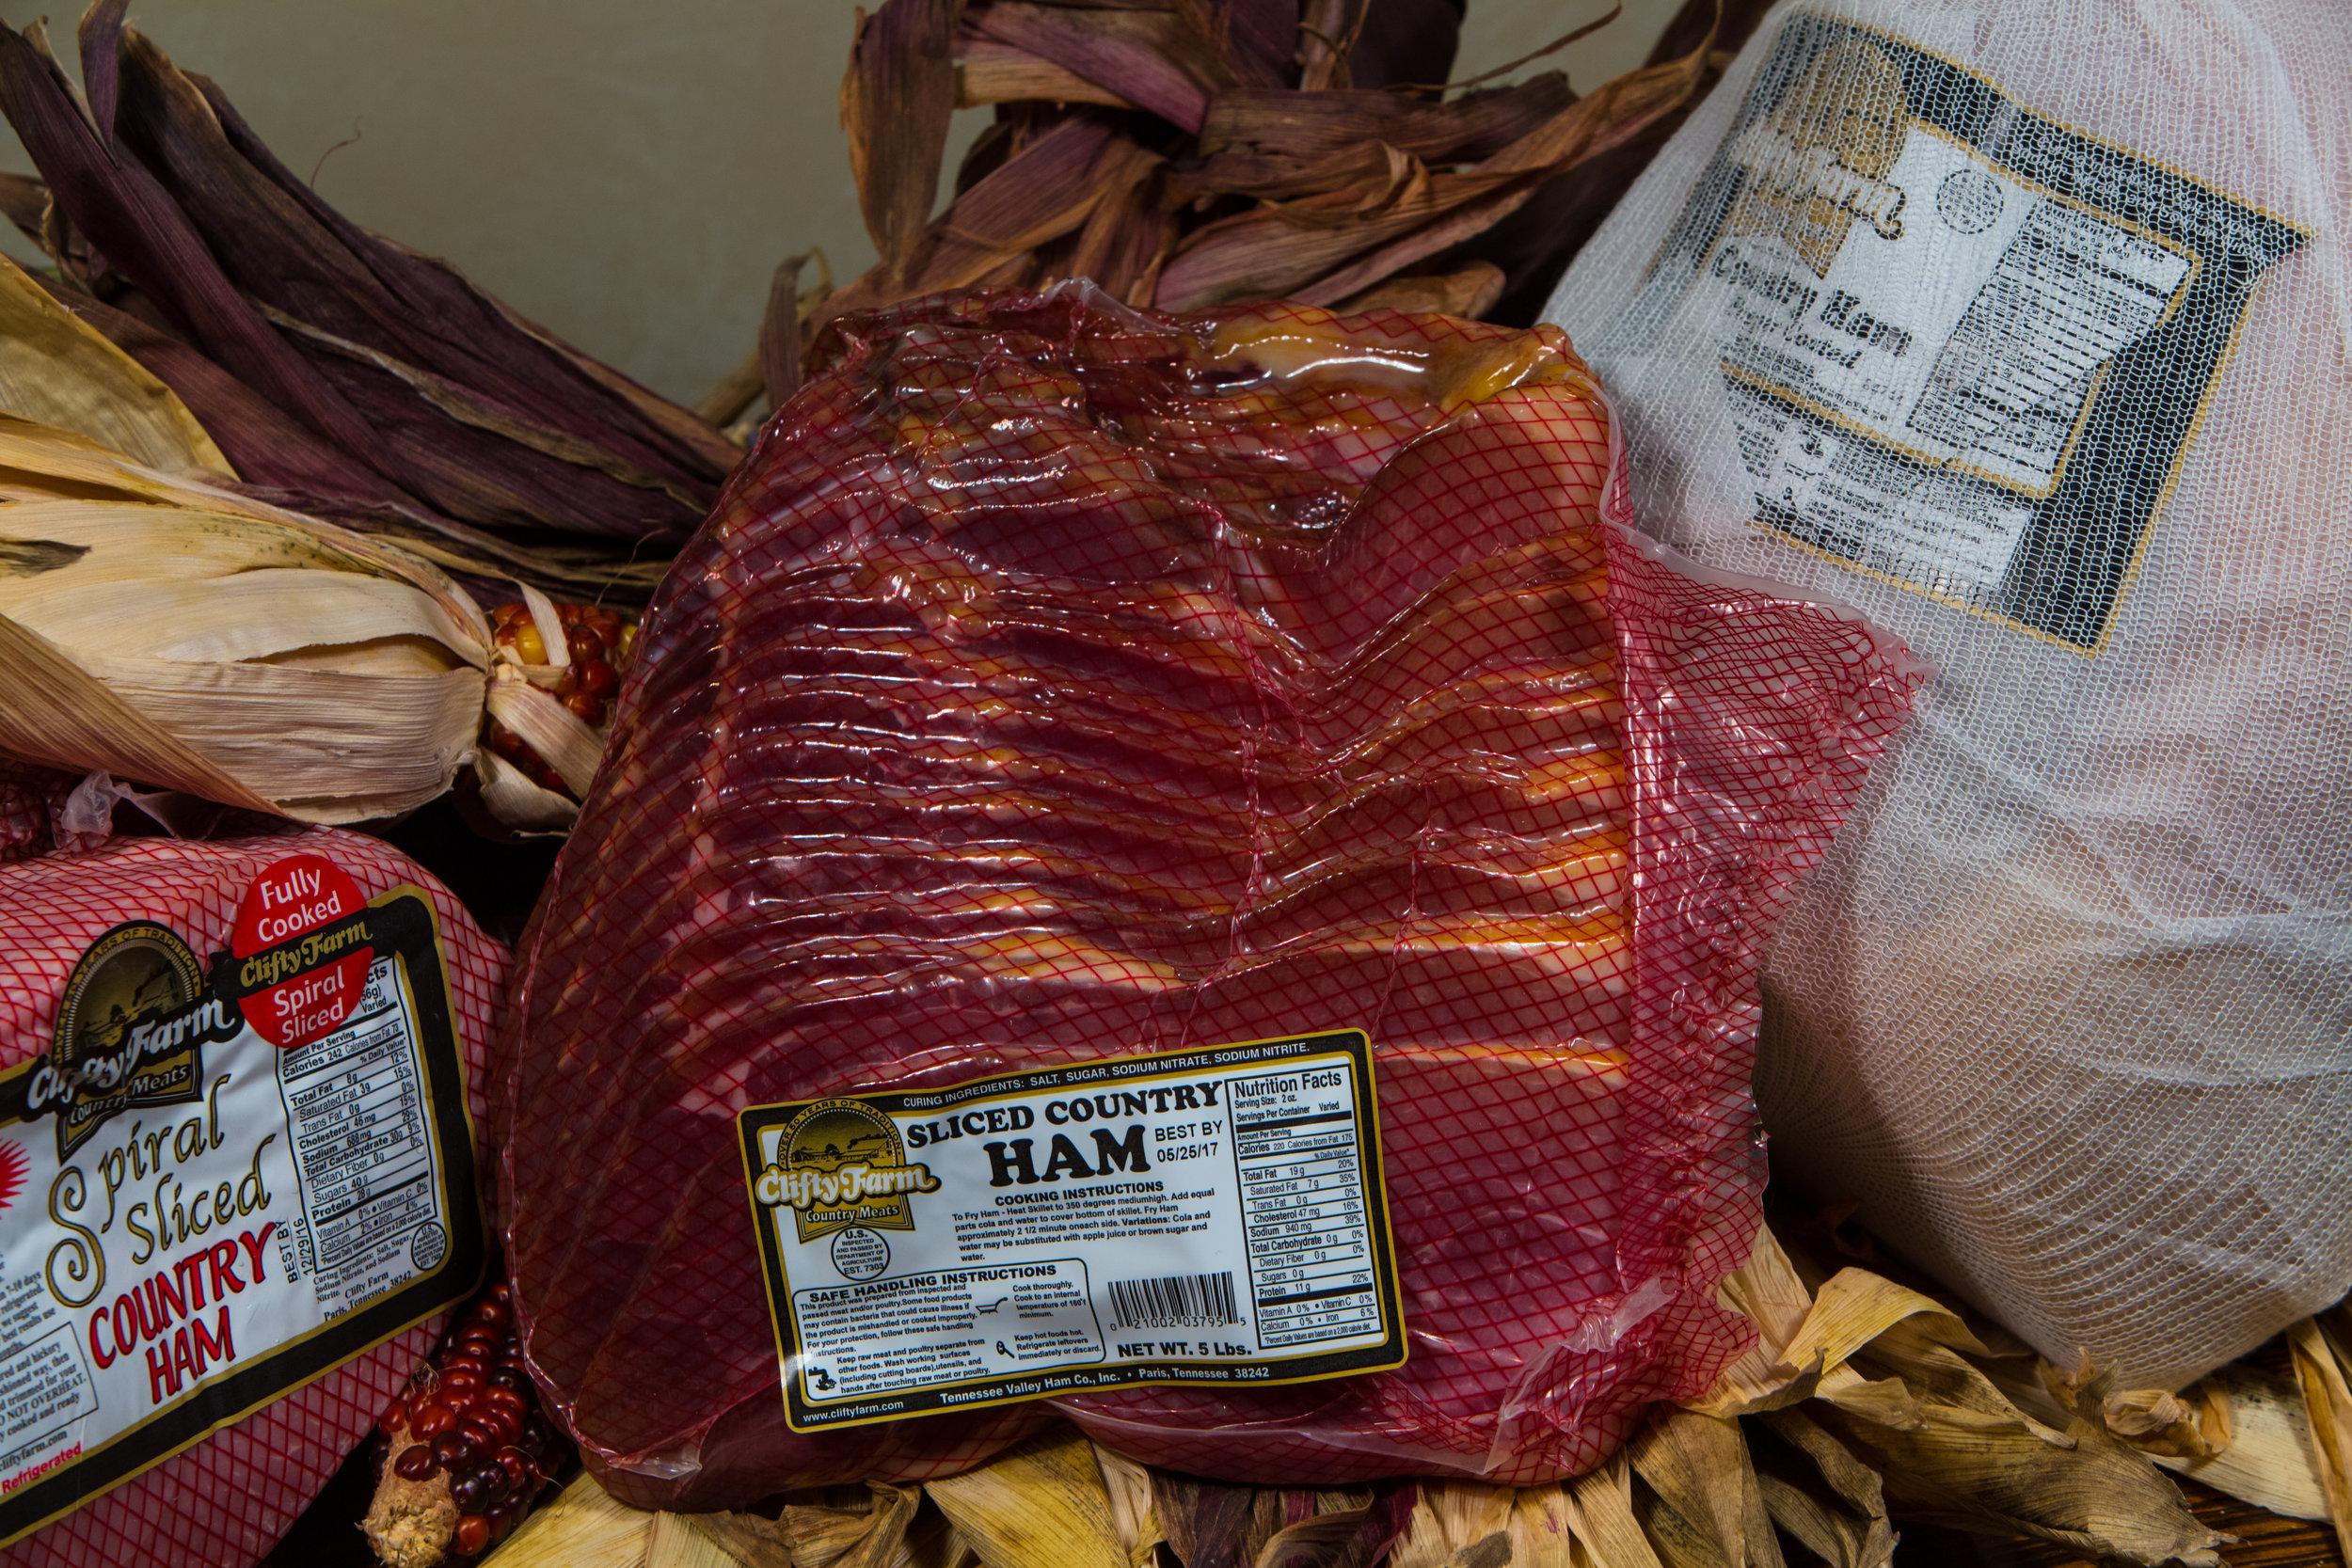 4/5lb Clifty Farm Pre-Sliced Country Ham